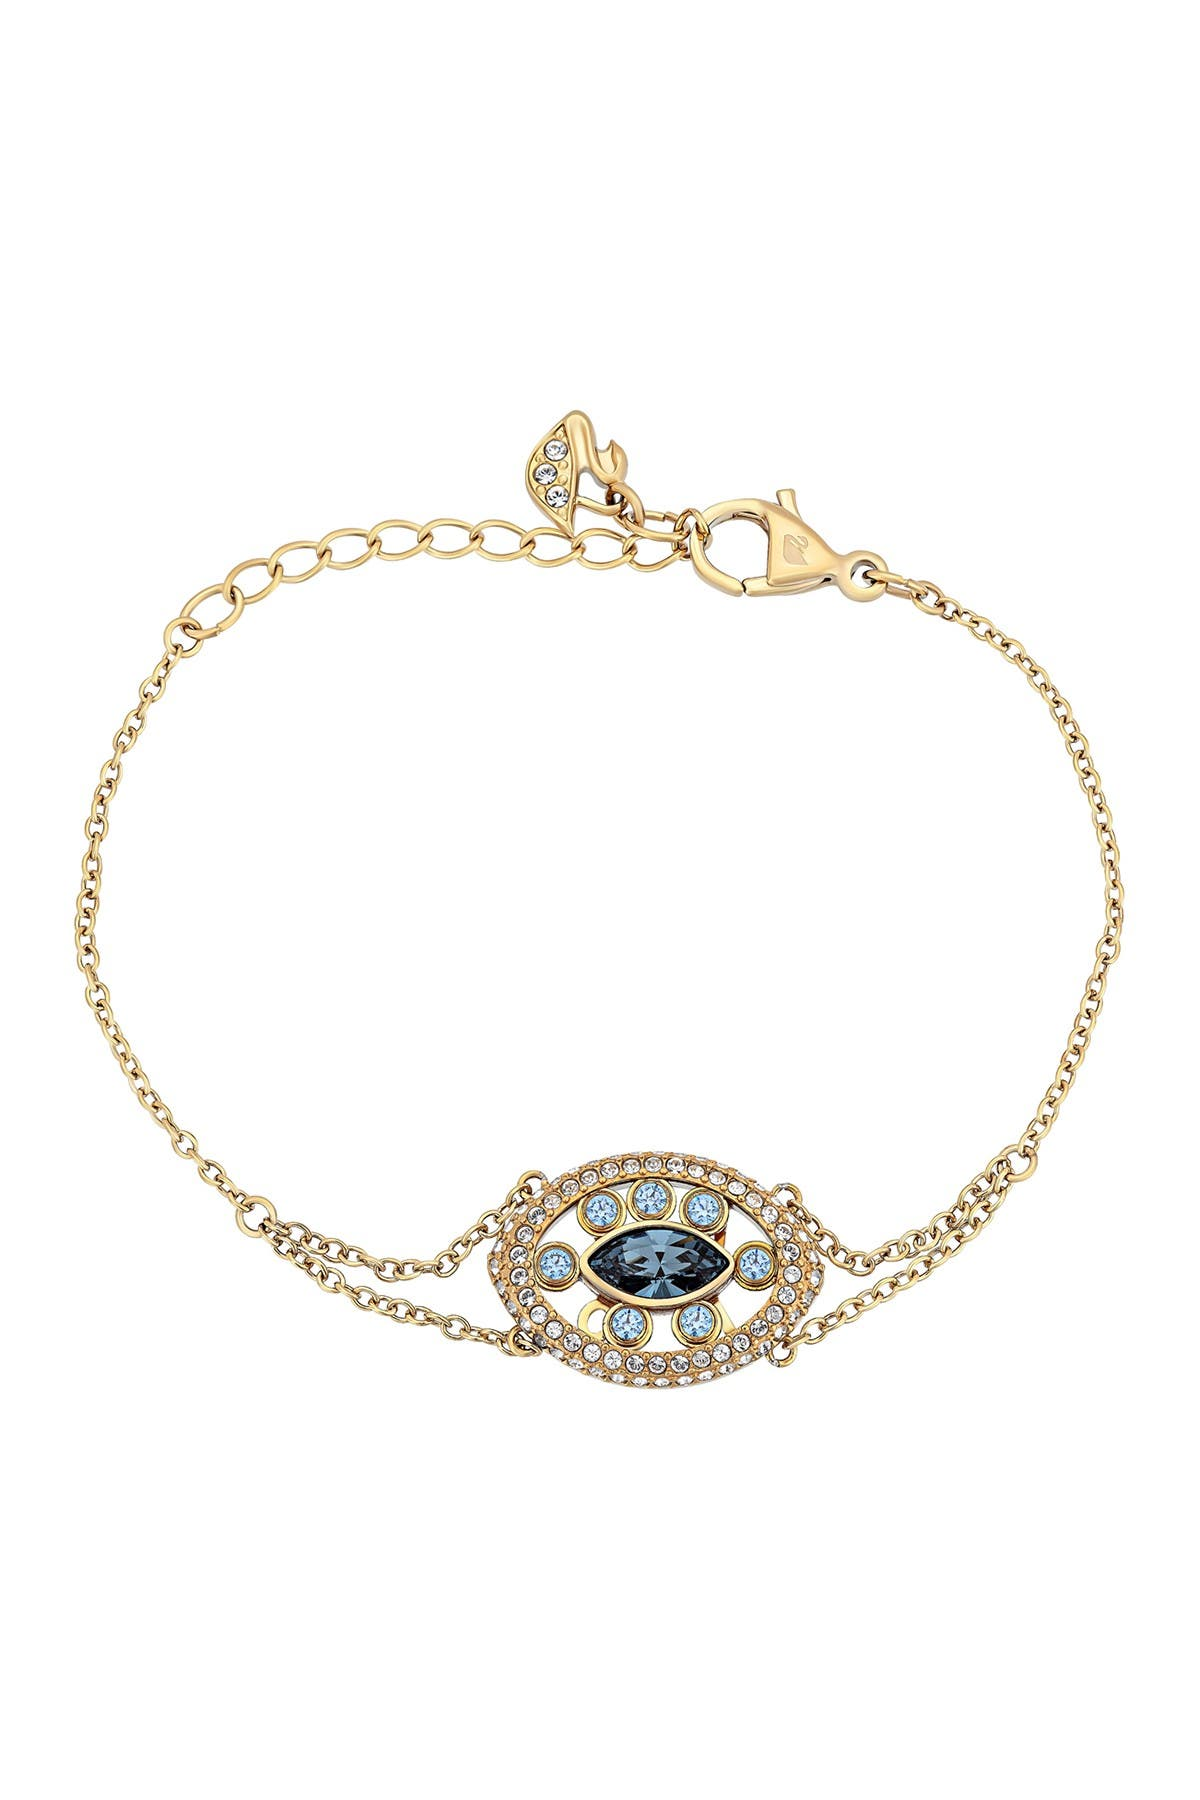 Image of Swarovski Admiration Swarovski Crystal Pendant Bracelet